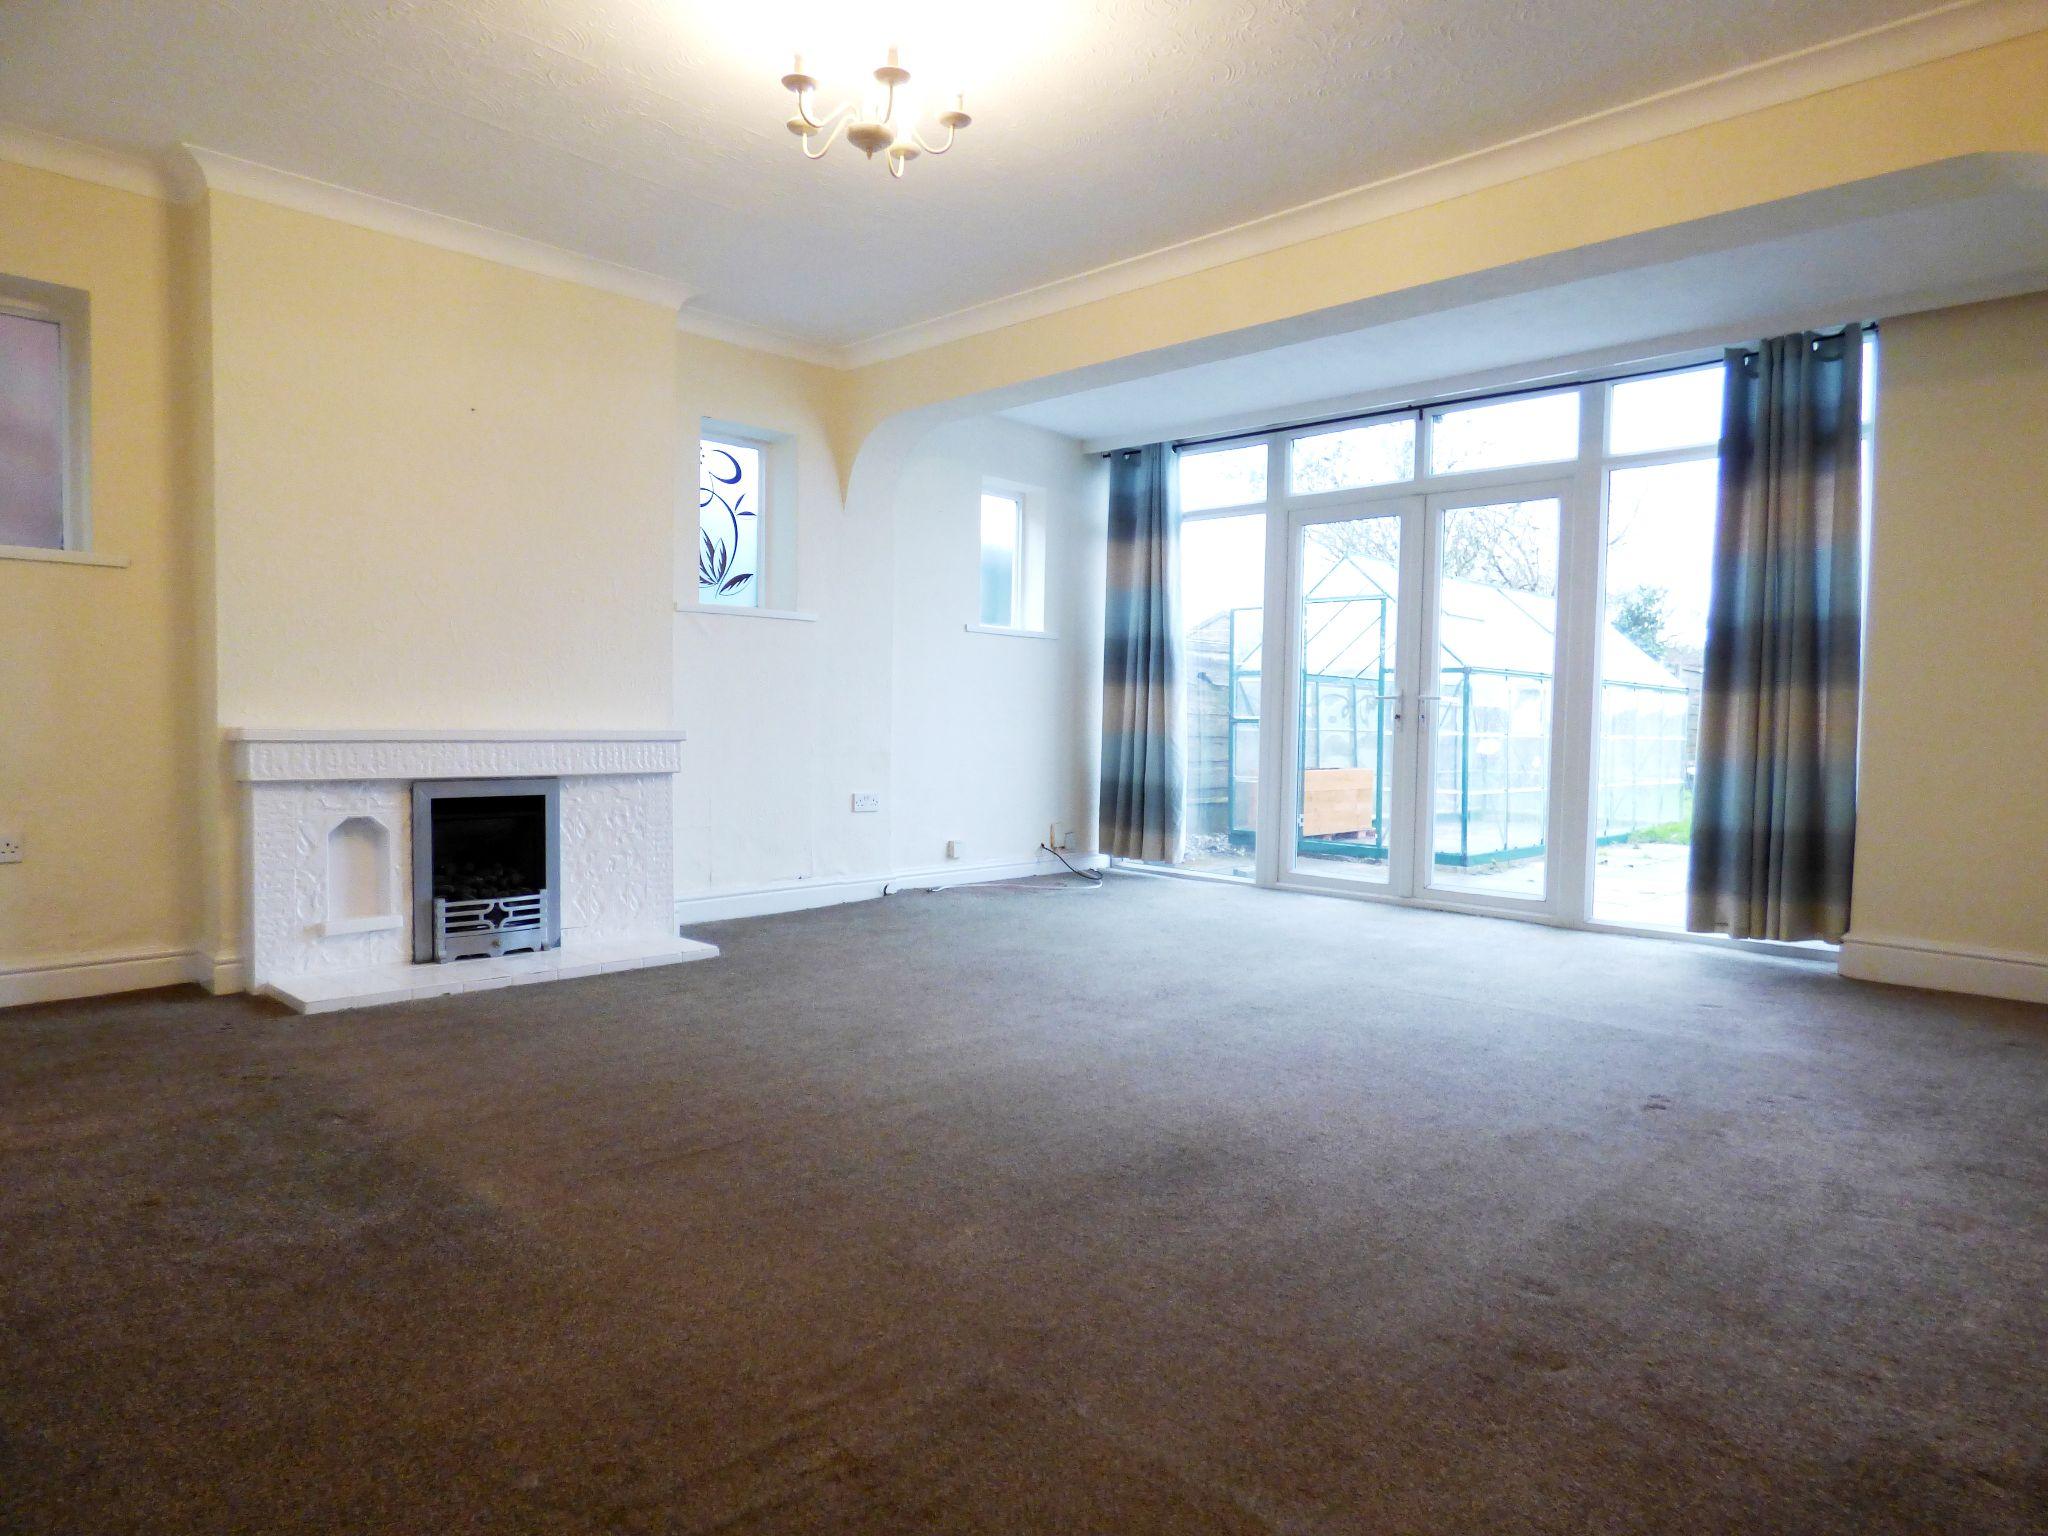 3 Bedroom Detached Bungalow For Sale - Lounge